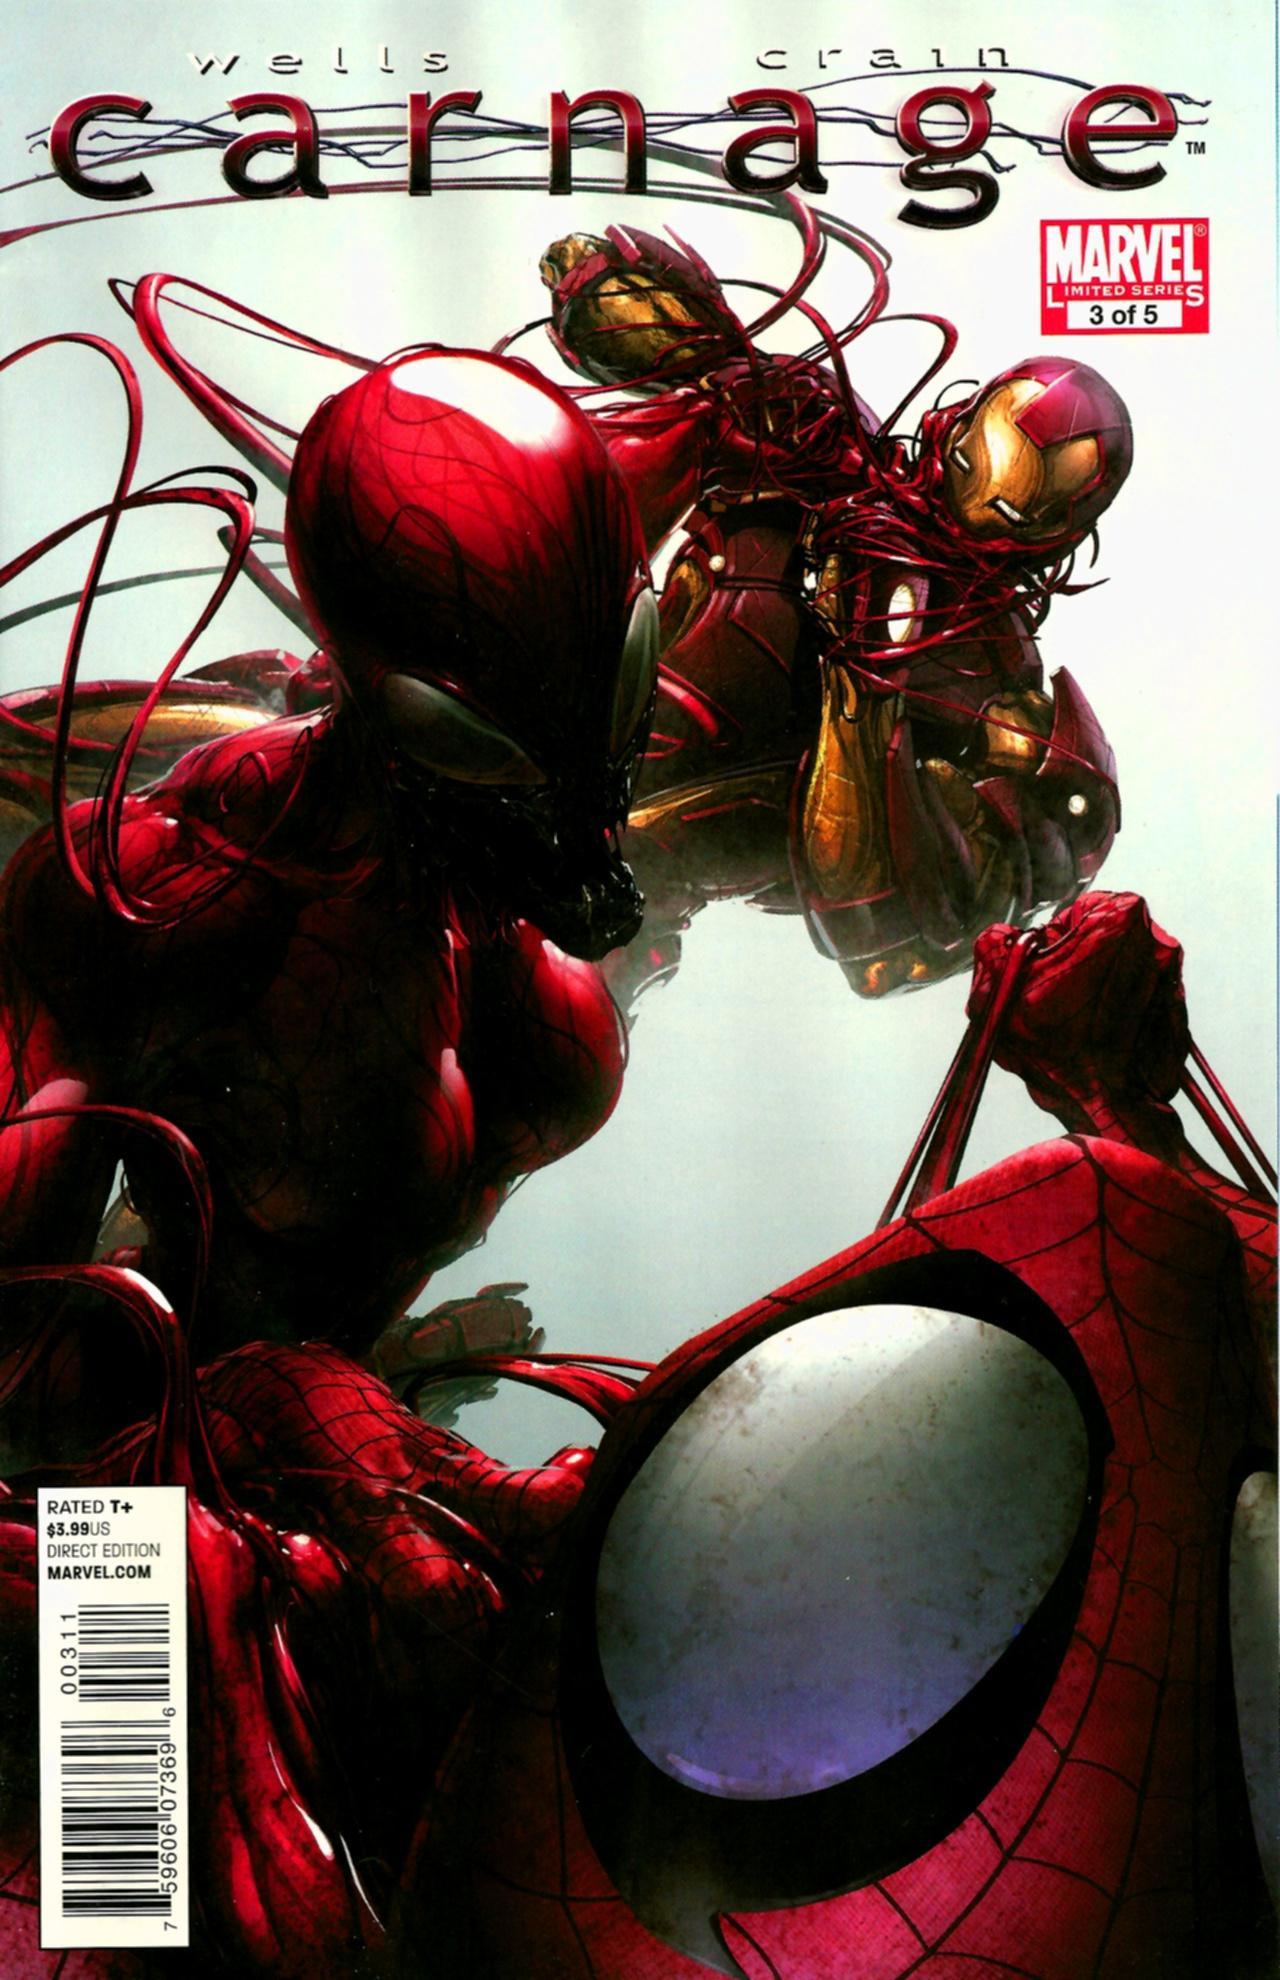 Carnage Vol 1 3 | Marvel Database | FANDOM powered by Wikia